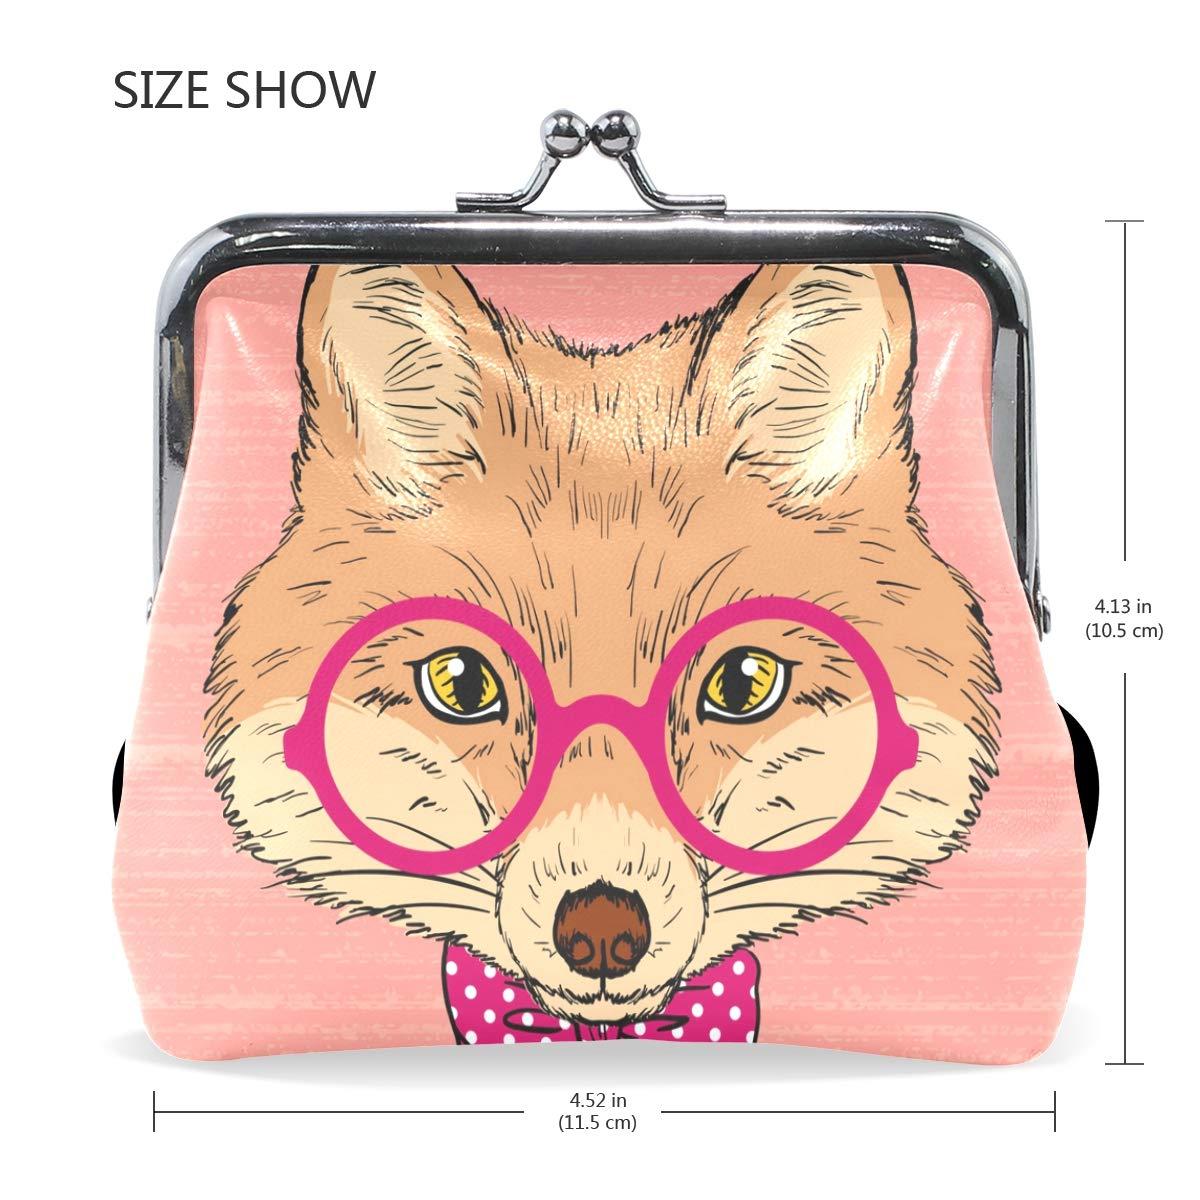 LALATOP Hand Painted Fox Womens Coin Pouch Purse wallet Card Holder Clutch Handbag